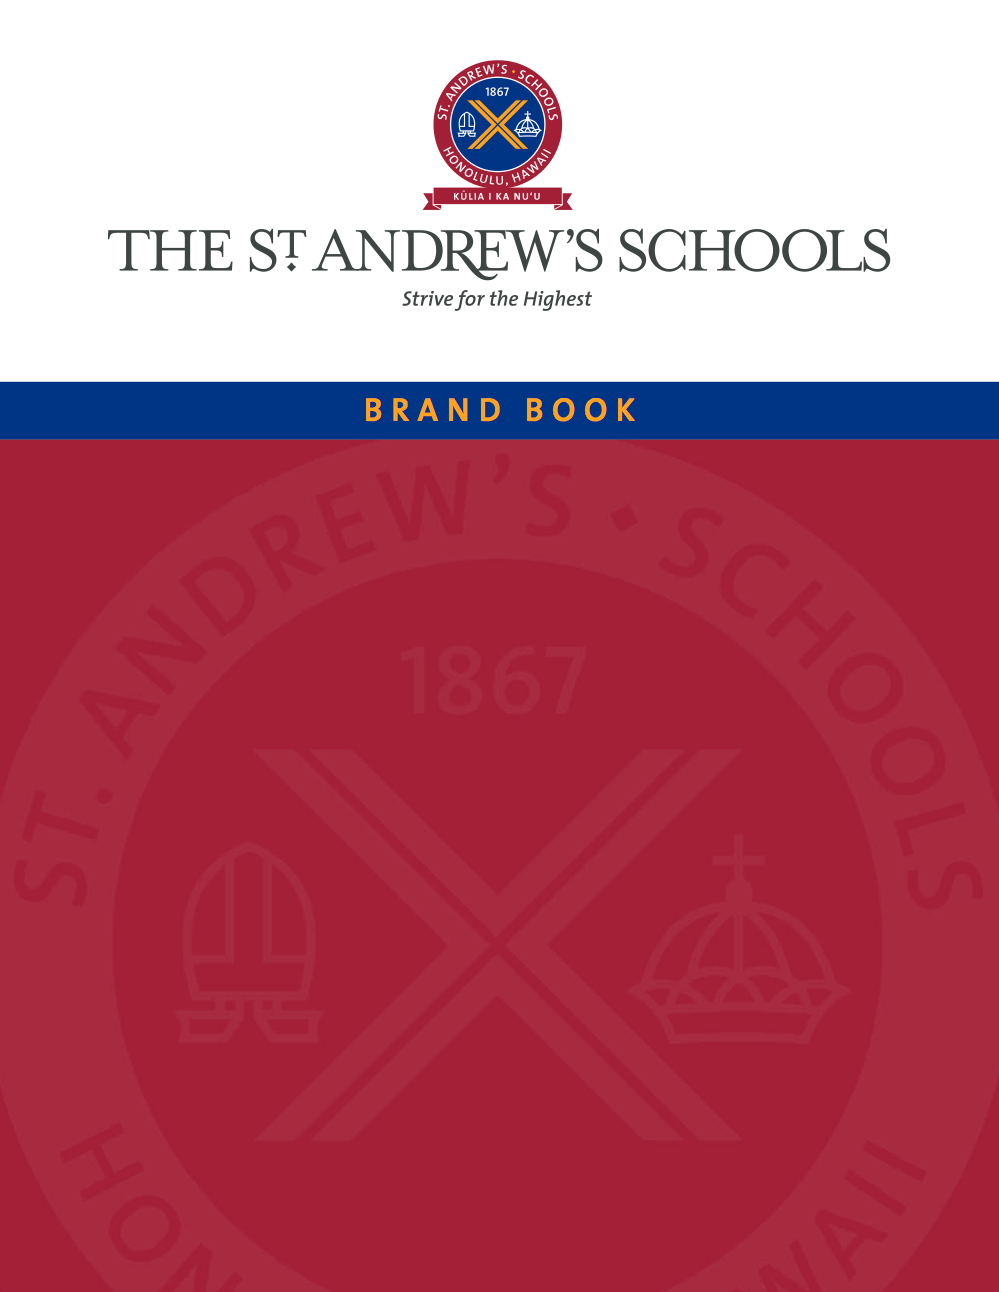 St. Andrew's Schools brand book